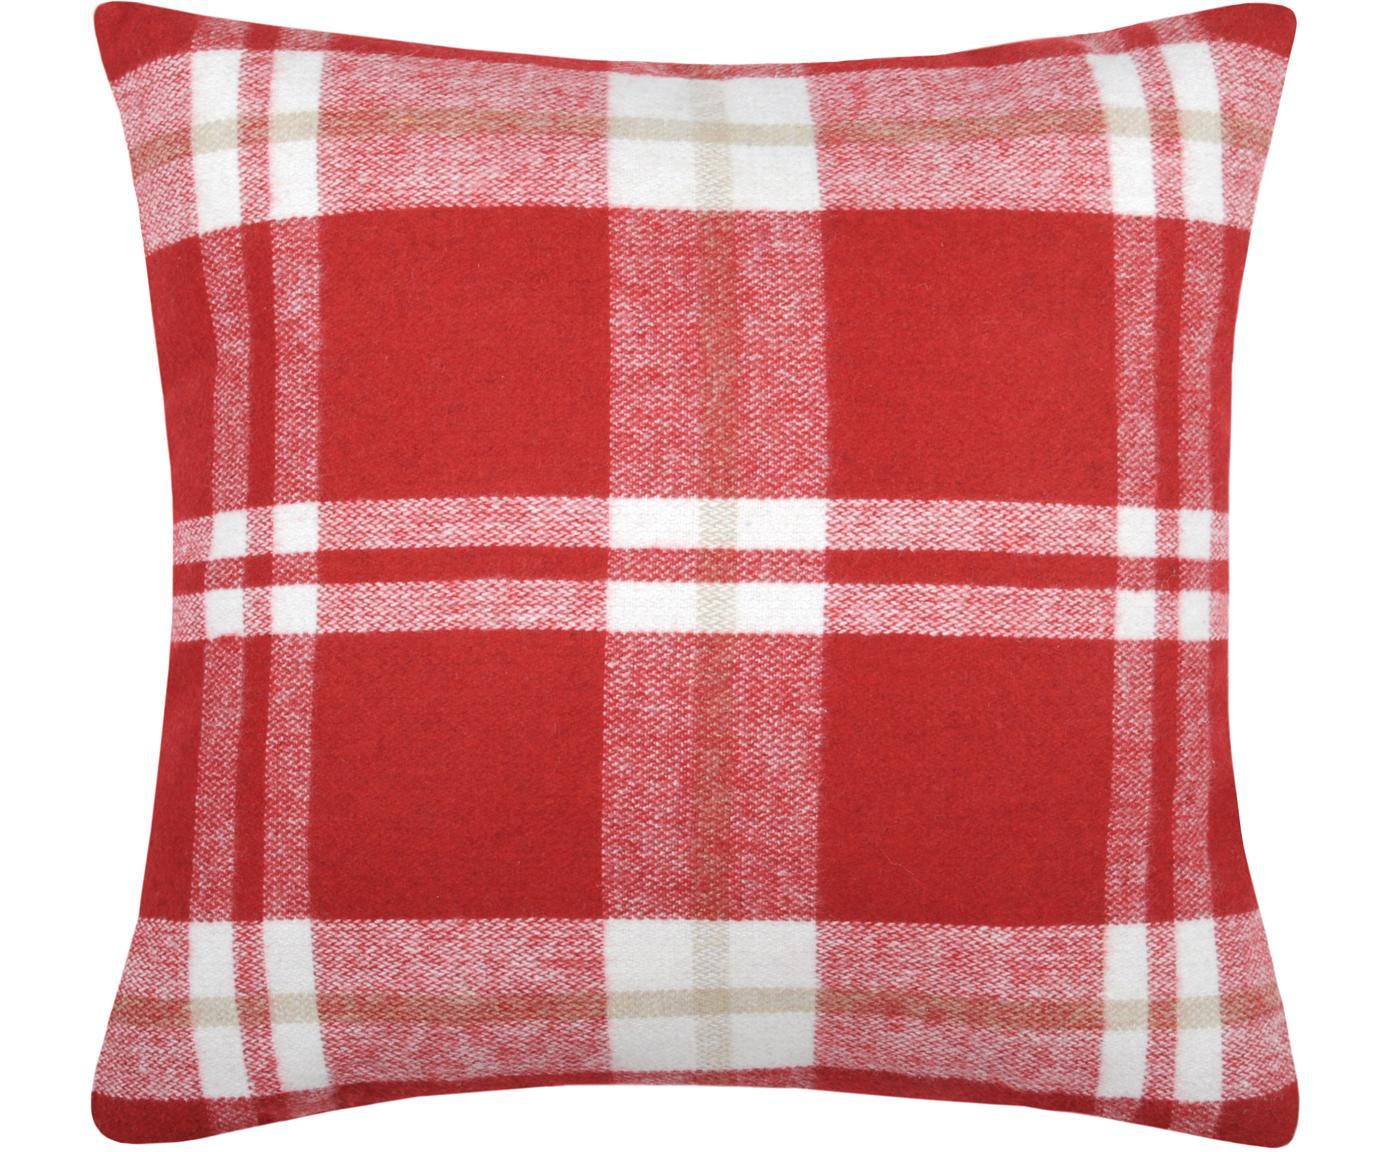 Geruite kussenhoes Granier, 95% polyester, 5% wol, Rood, wit, beige, 40 x 40 cm